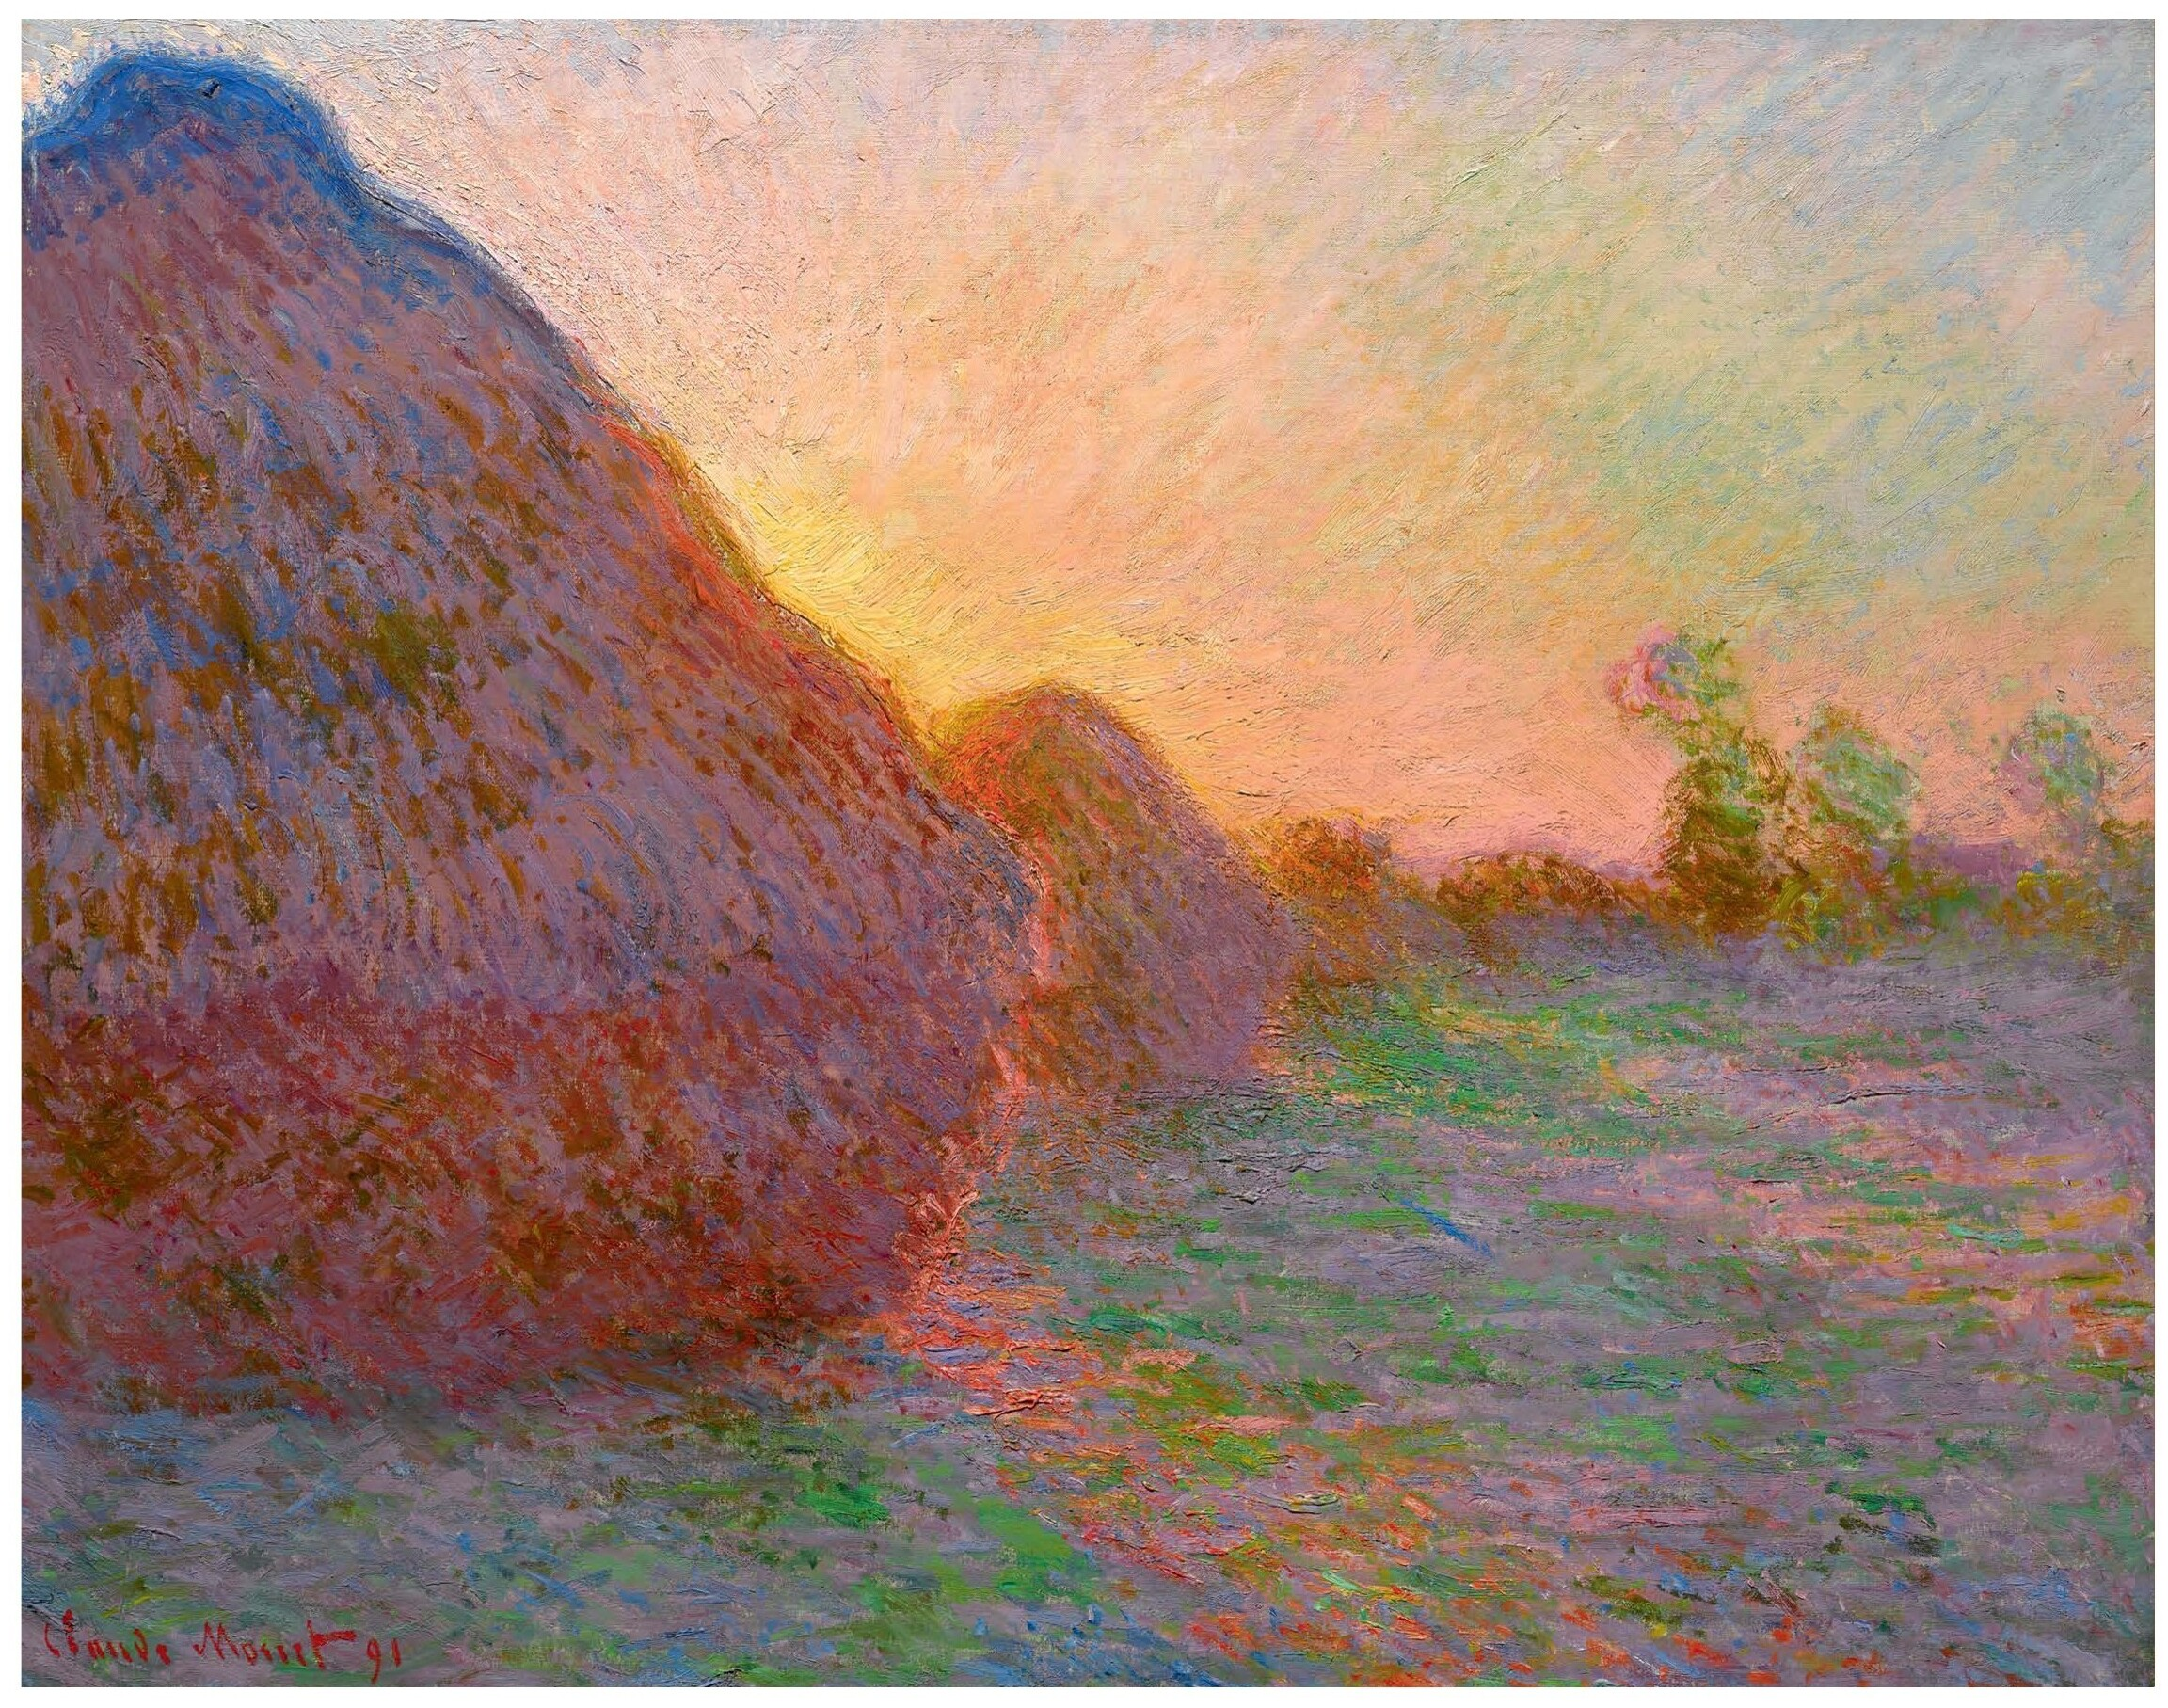 Claude Monet - Haystacks (1890)